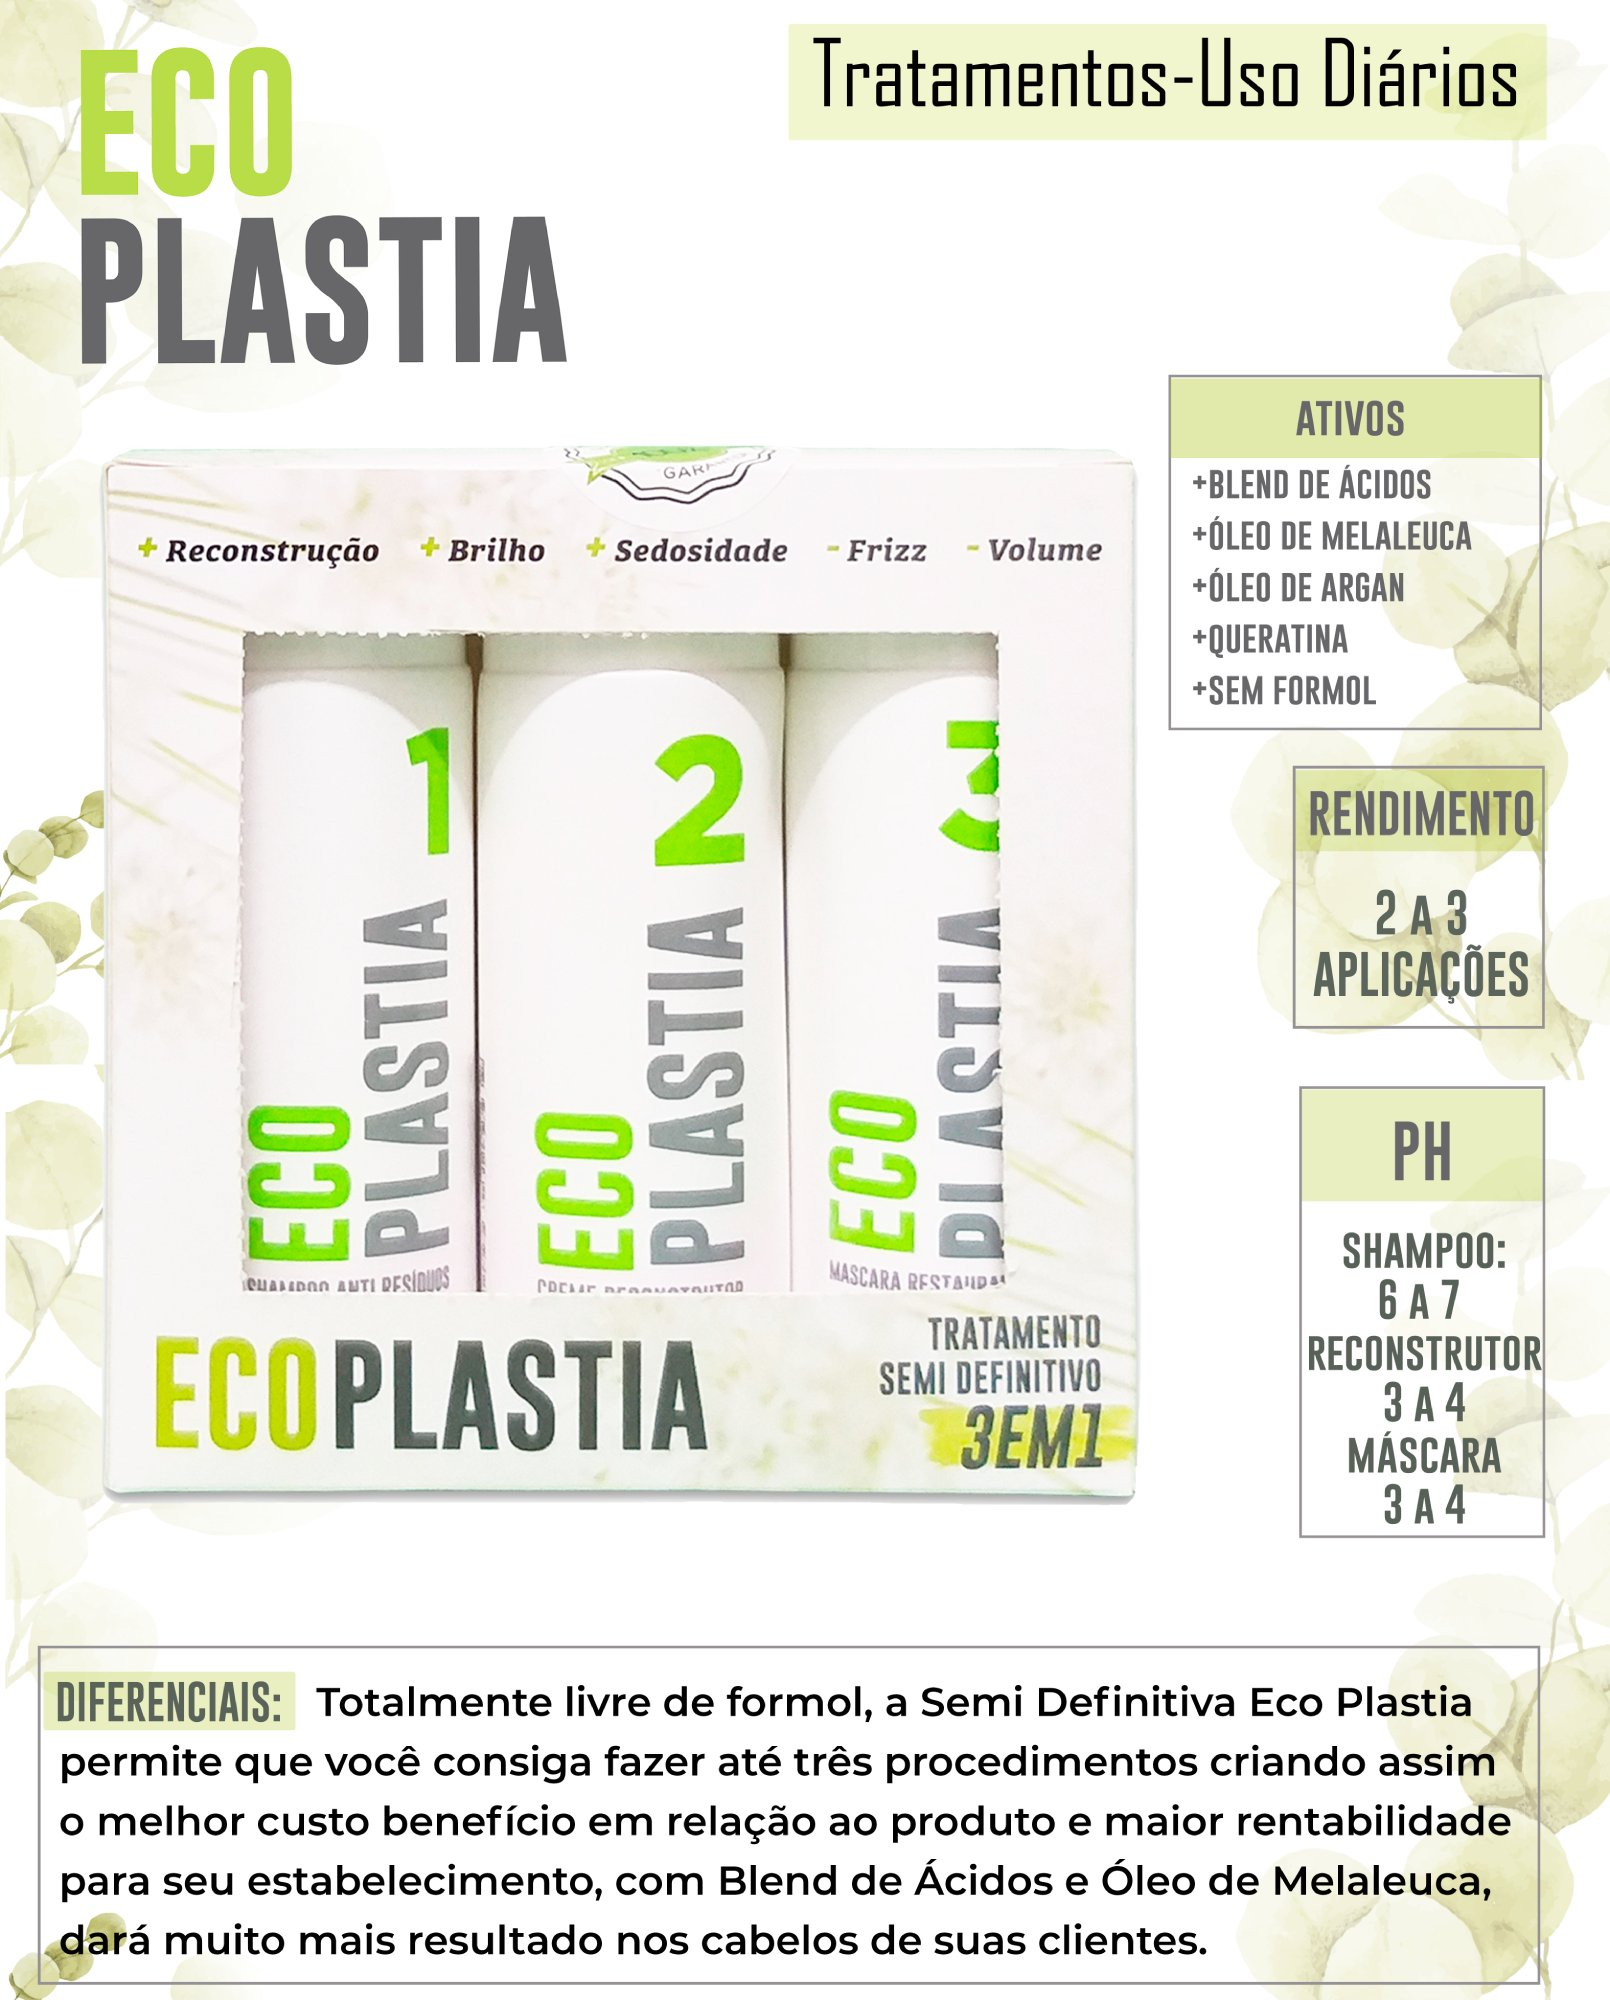 Kit Pequeno Semi Definitiva Sem Formol EcoPlastia - 3 em 1